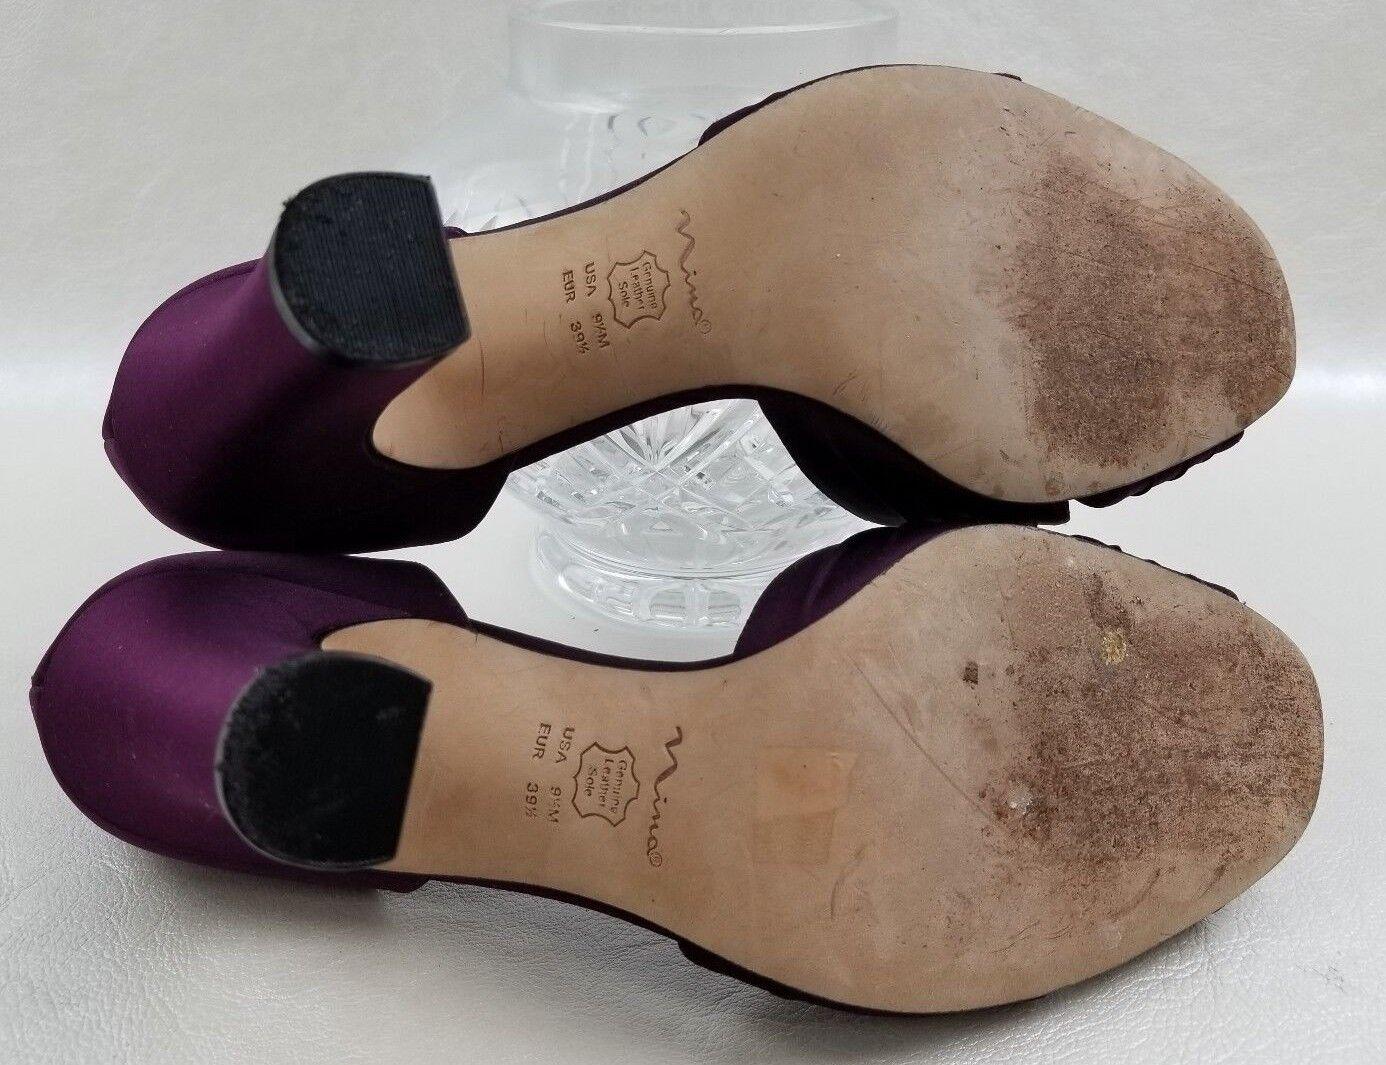 Nina Pumps Satin Satin Satin Formal Open Toe Block Heels Burgundy damen schuhe Größe 9.5M 96df9e